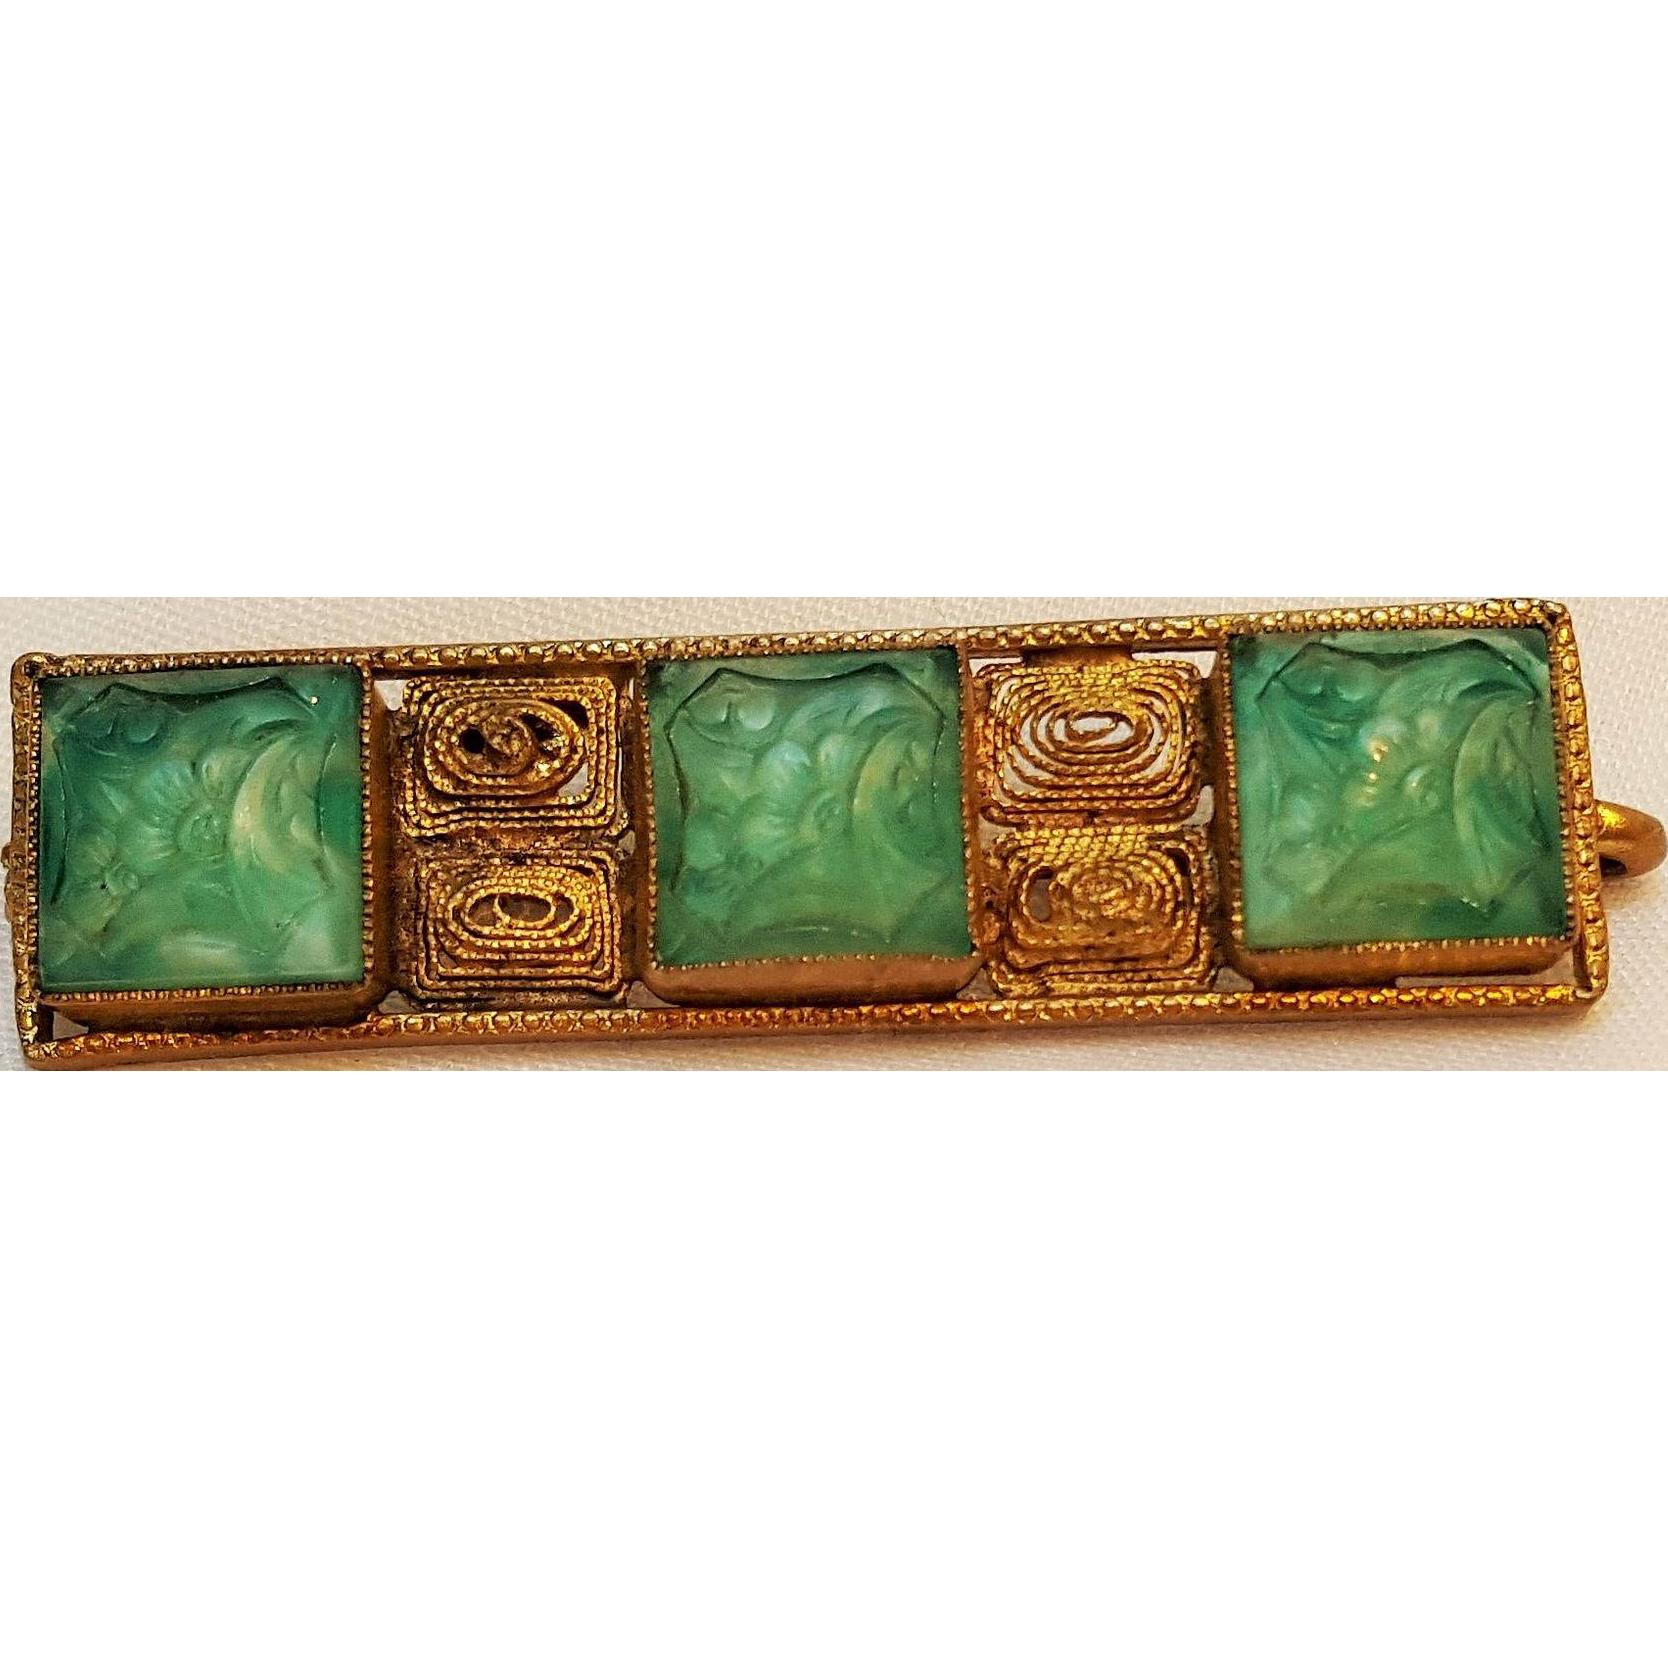 Czechoslovakia bar pin molded green glass filigree